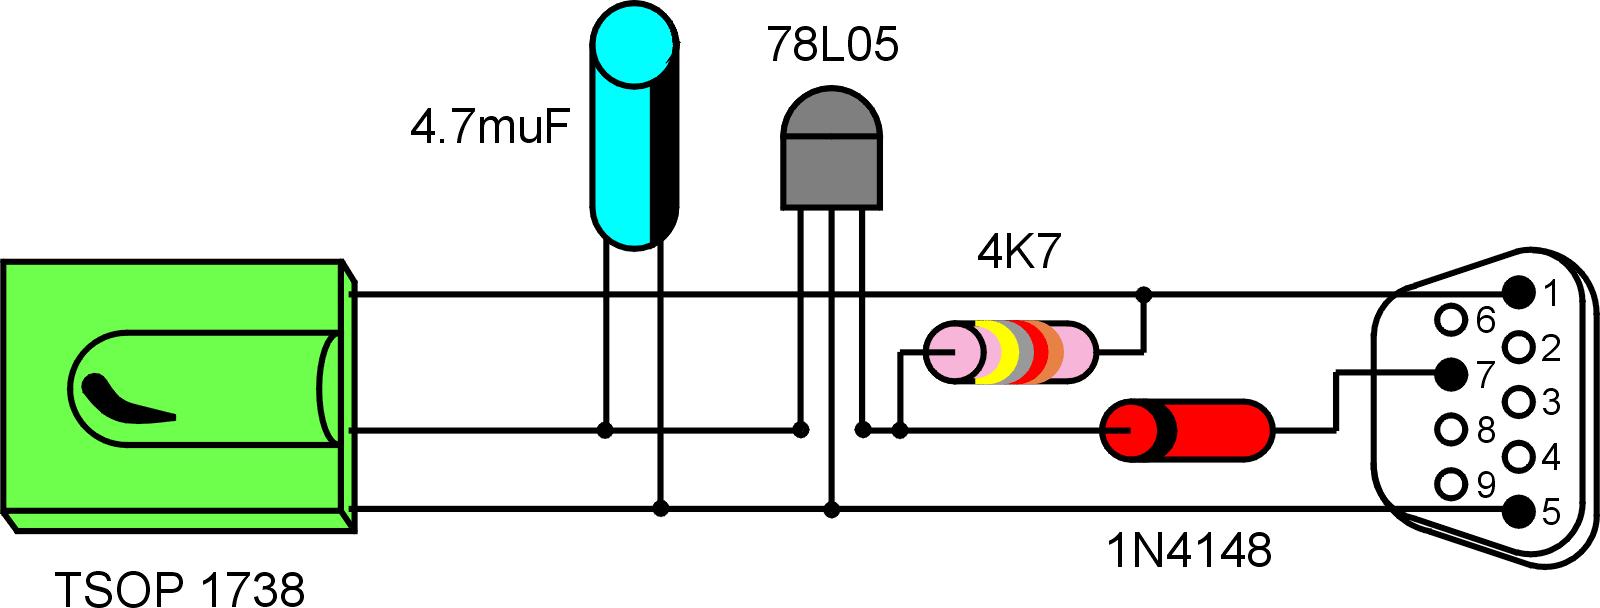 Control Remoto Para Pc Taringa Drones Diy Pinterest Gt Inverter As High Voltage Low Current Source L12655 Nextgr